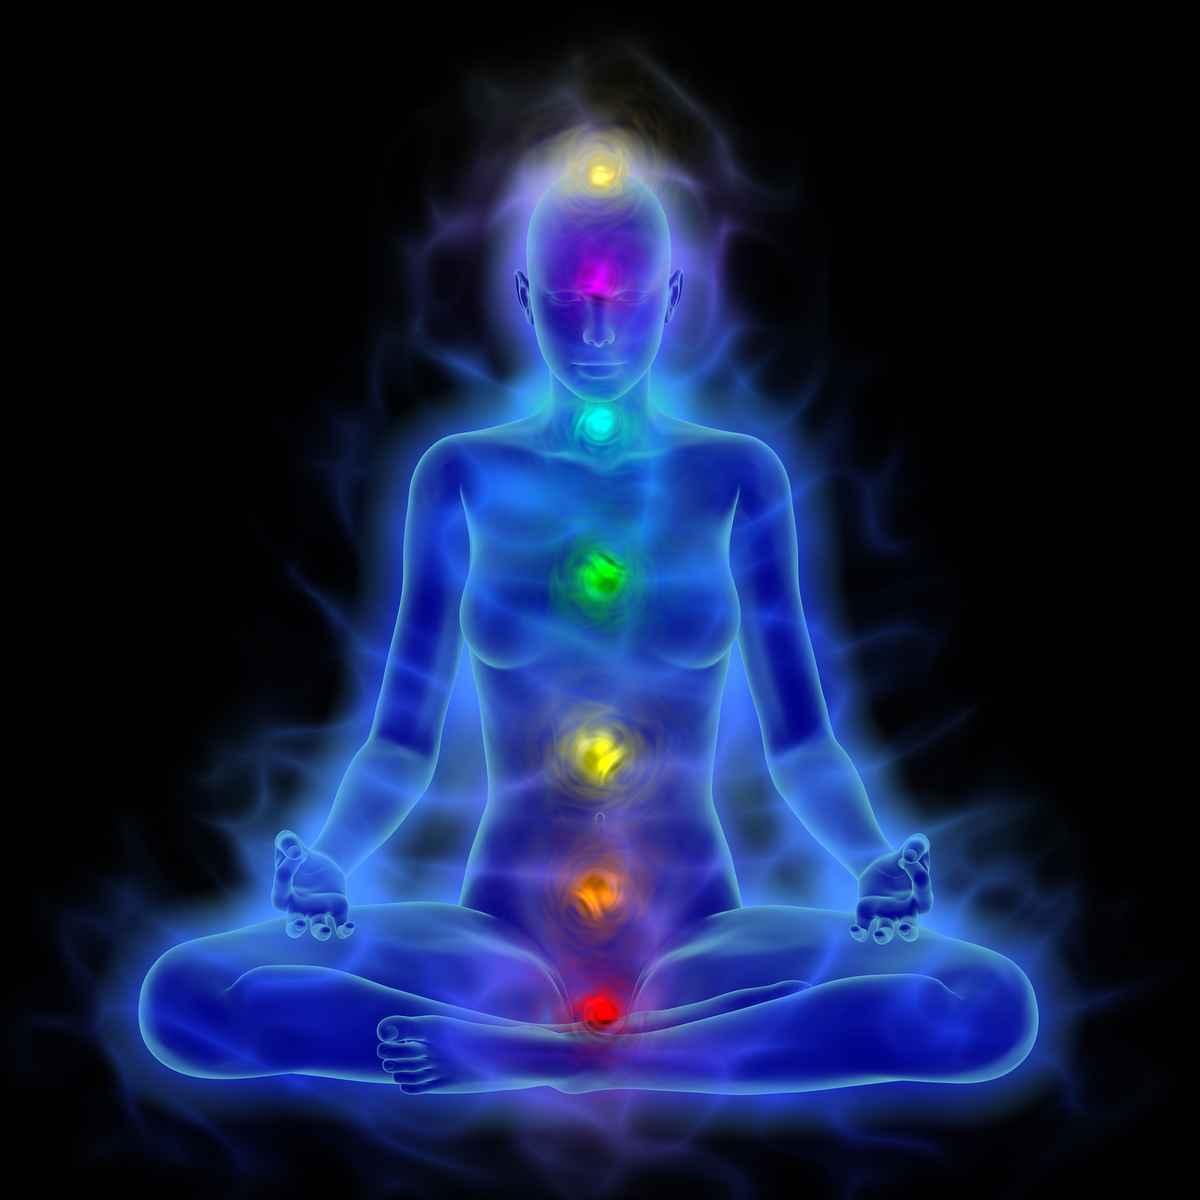 Human energy body aura chakra in meditation